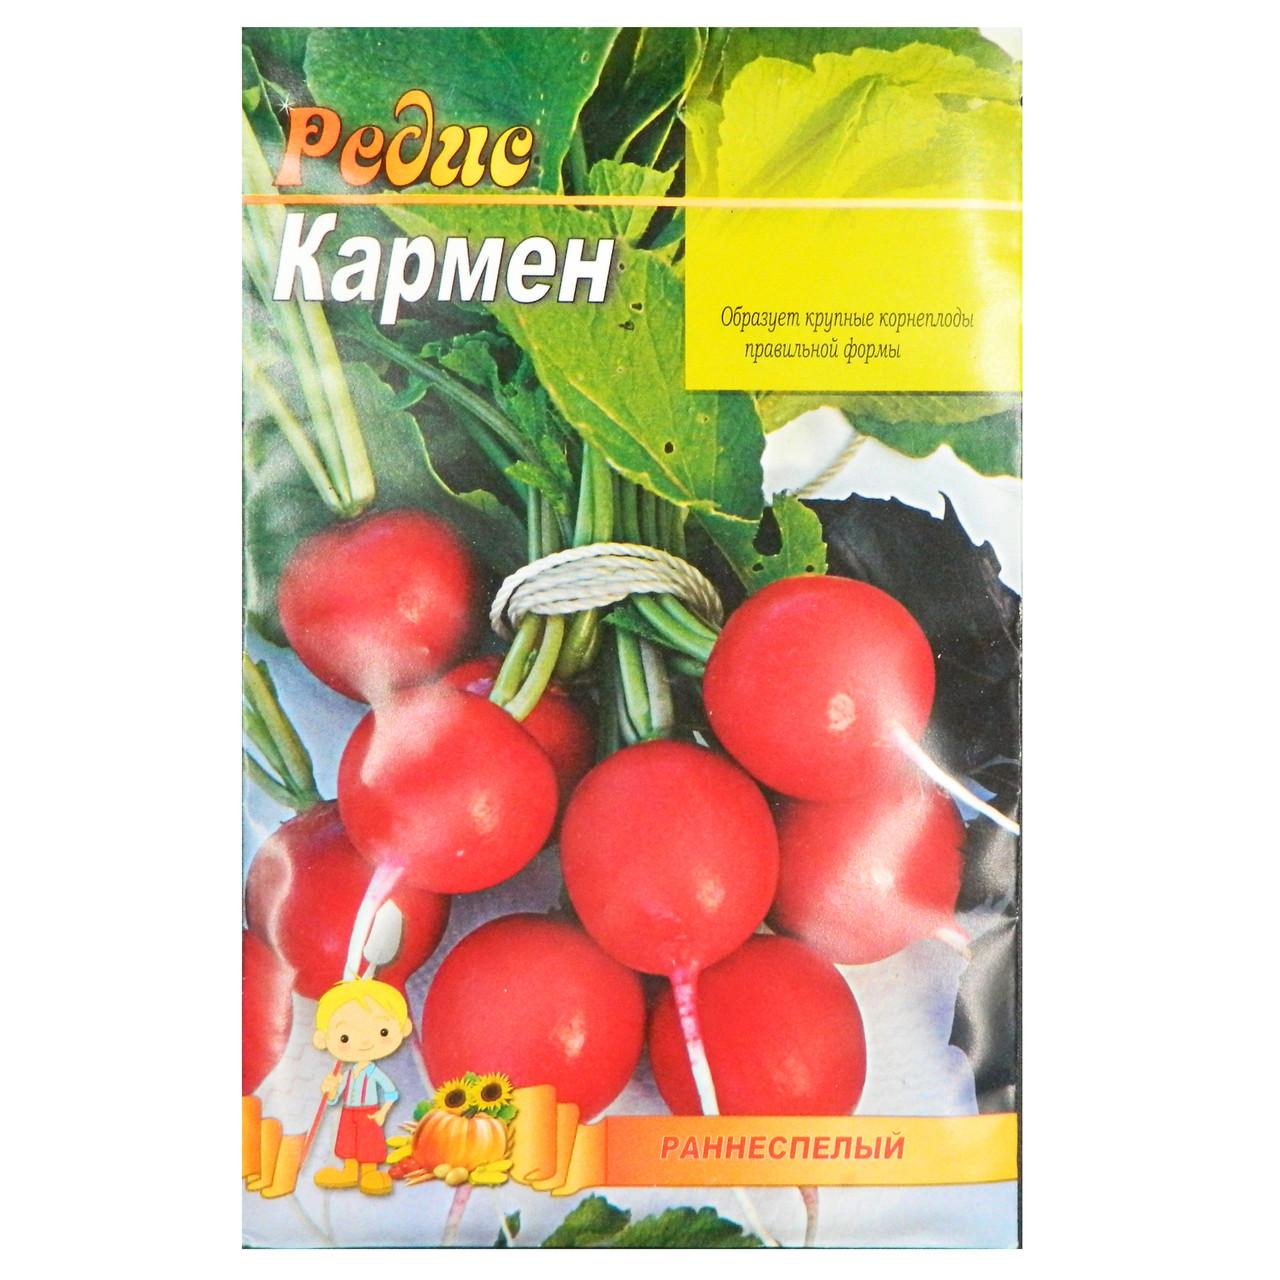 Семена редиса Кармен, раннеспелый